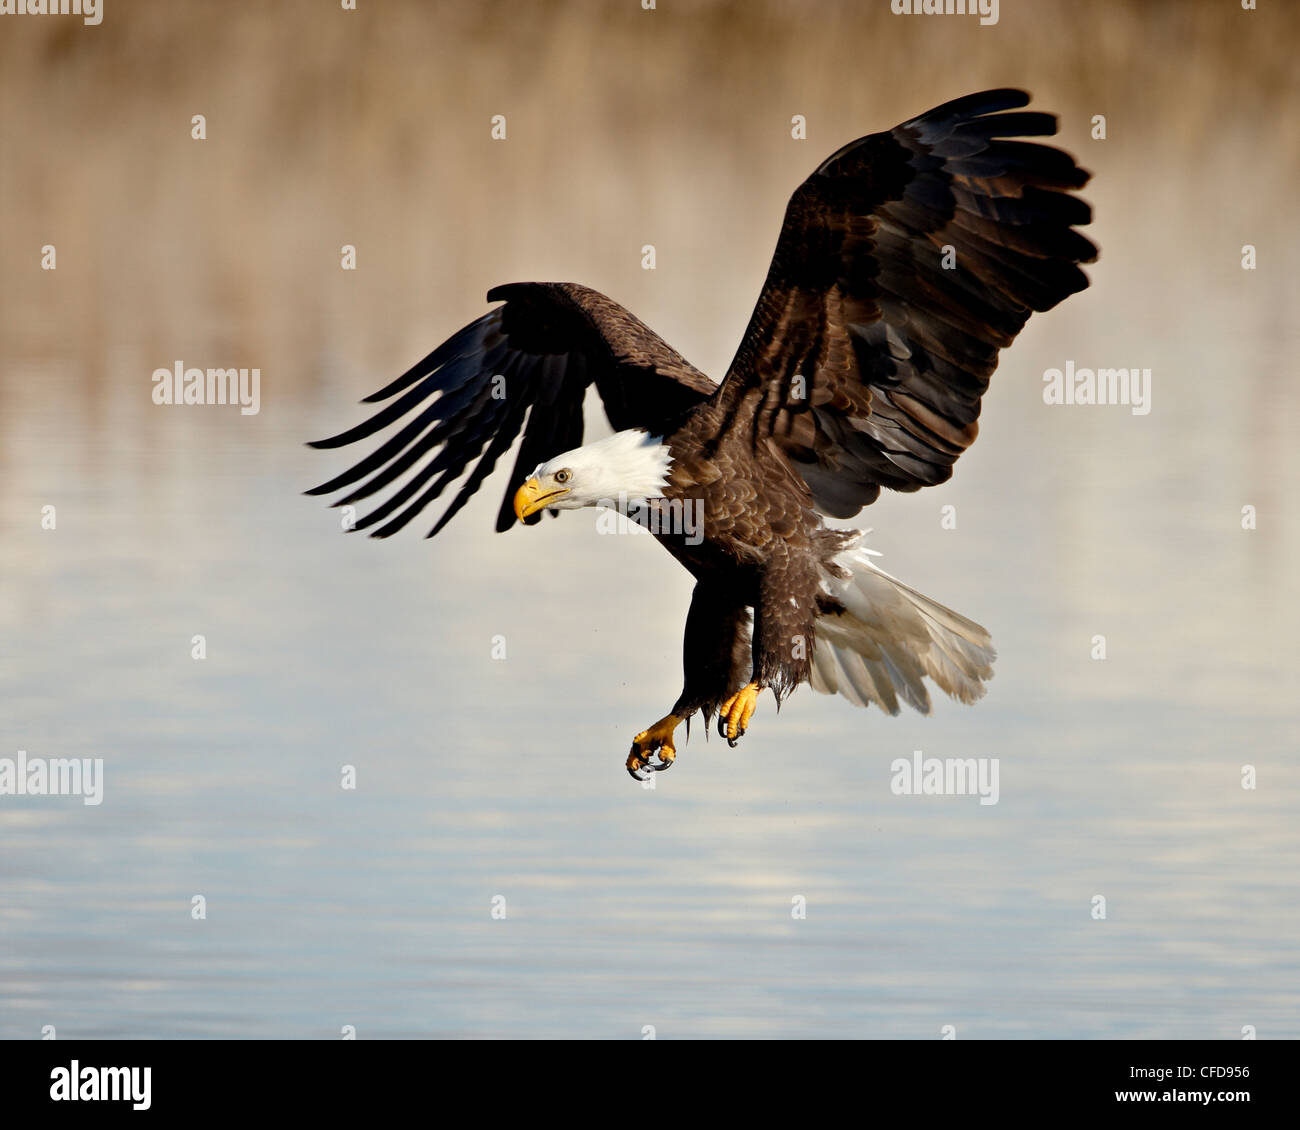 Aquila calva (Haliaeetus leucocephalus) in volo su approccio finale, Farmington Bay, Utah, Stati Uniti d'America, Immagini Stock